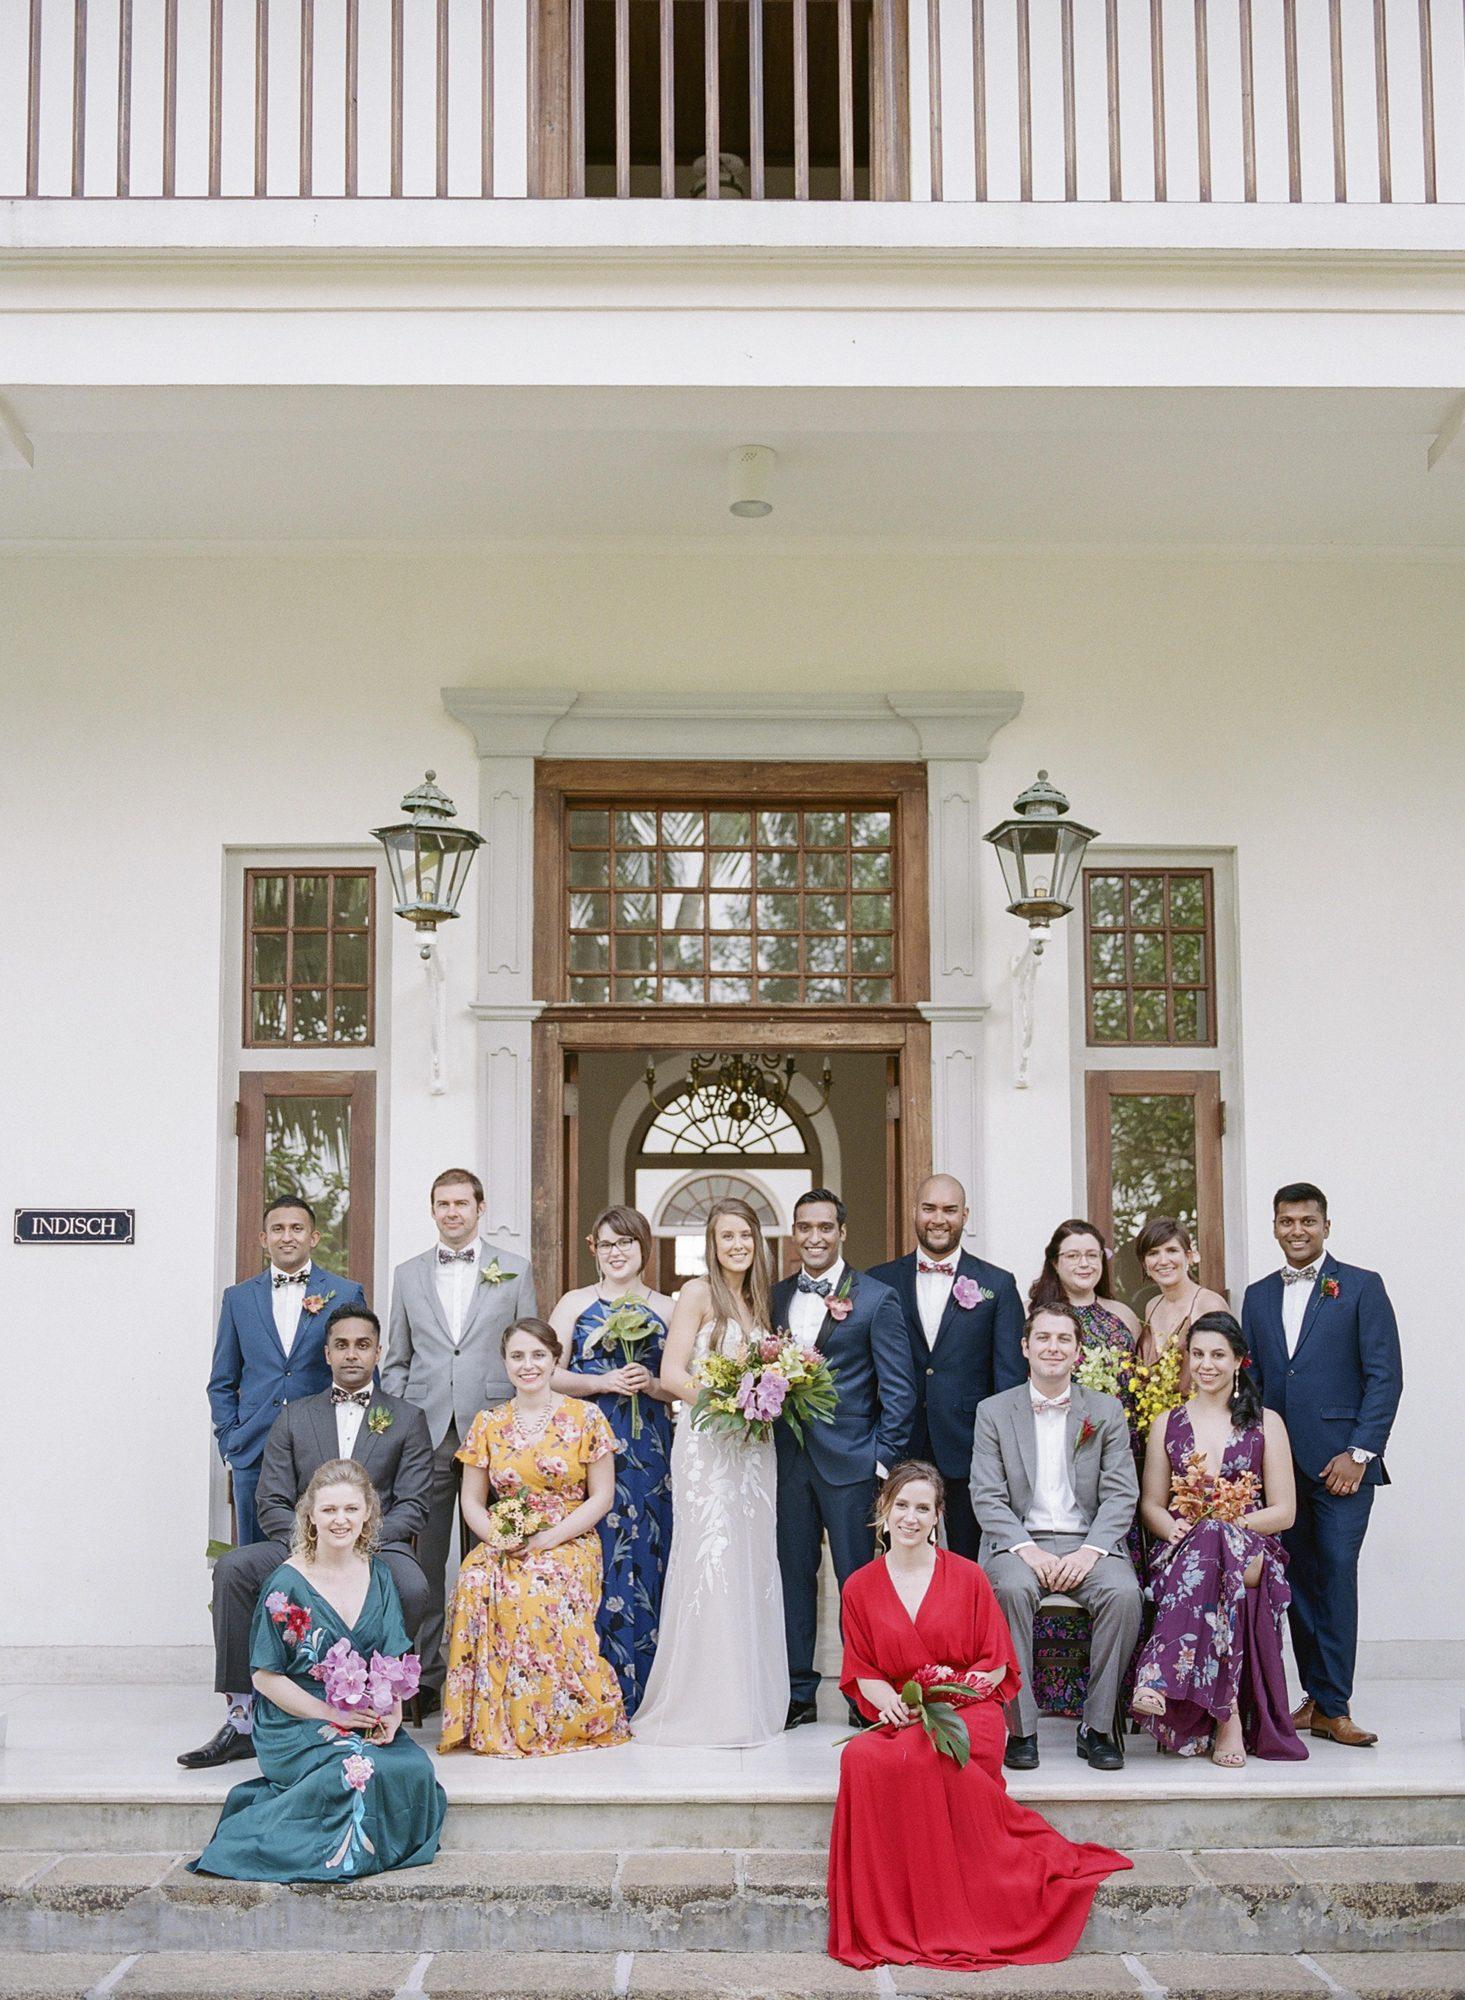 kelly sanjiv wedding couple with family